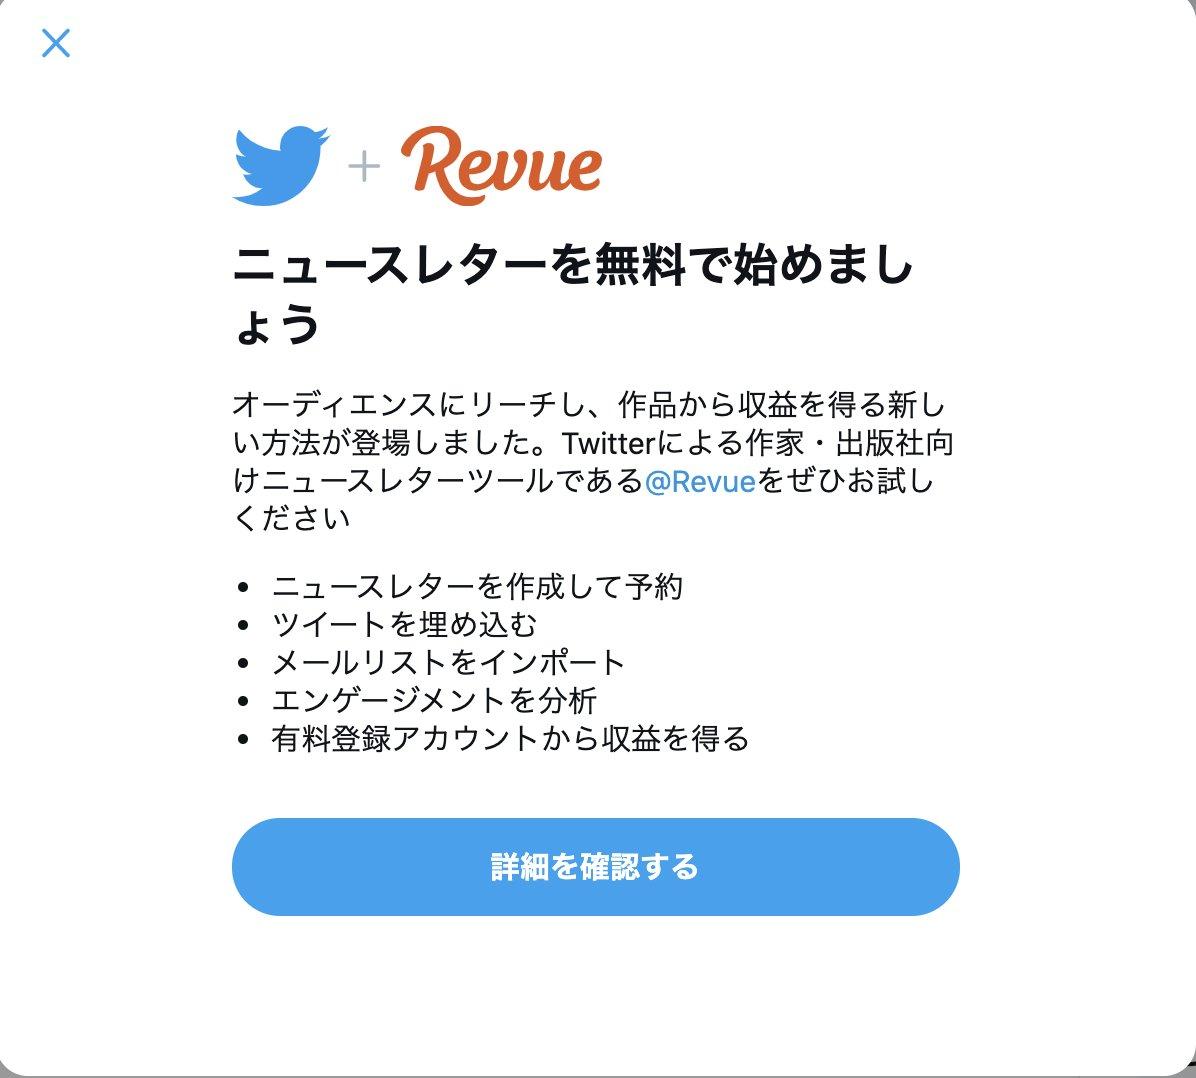 Twitterの「…」からニュースレター機能に飛んで連携できる🧡 Revue is joining Twitter! 💙 by @revue  @revueより